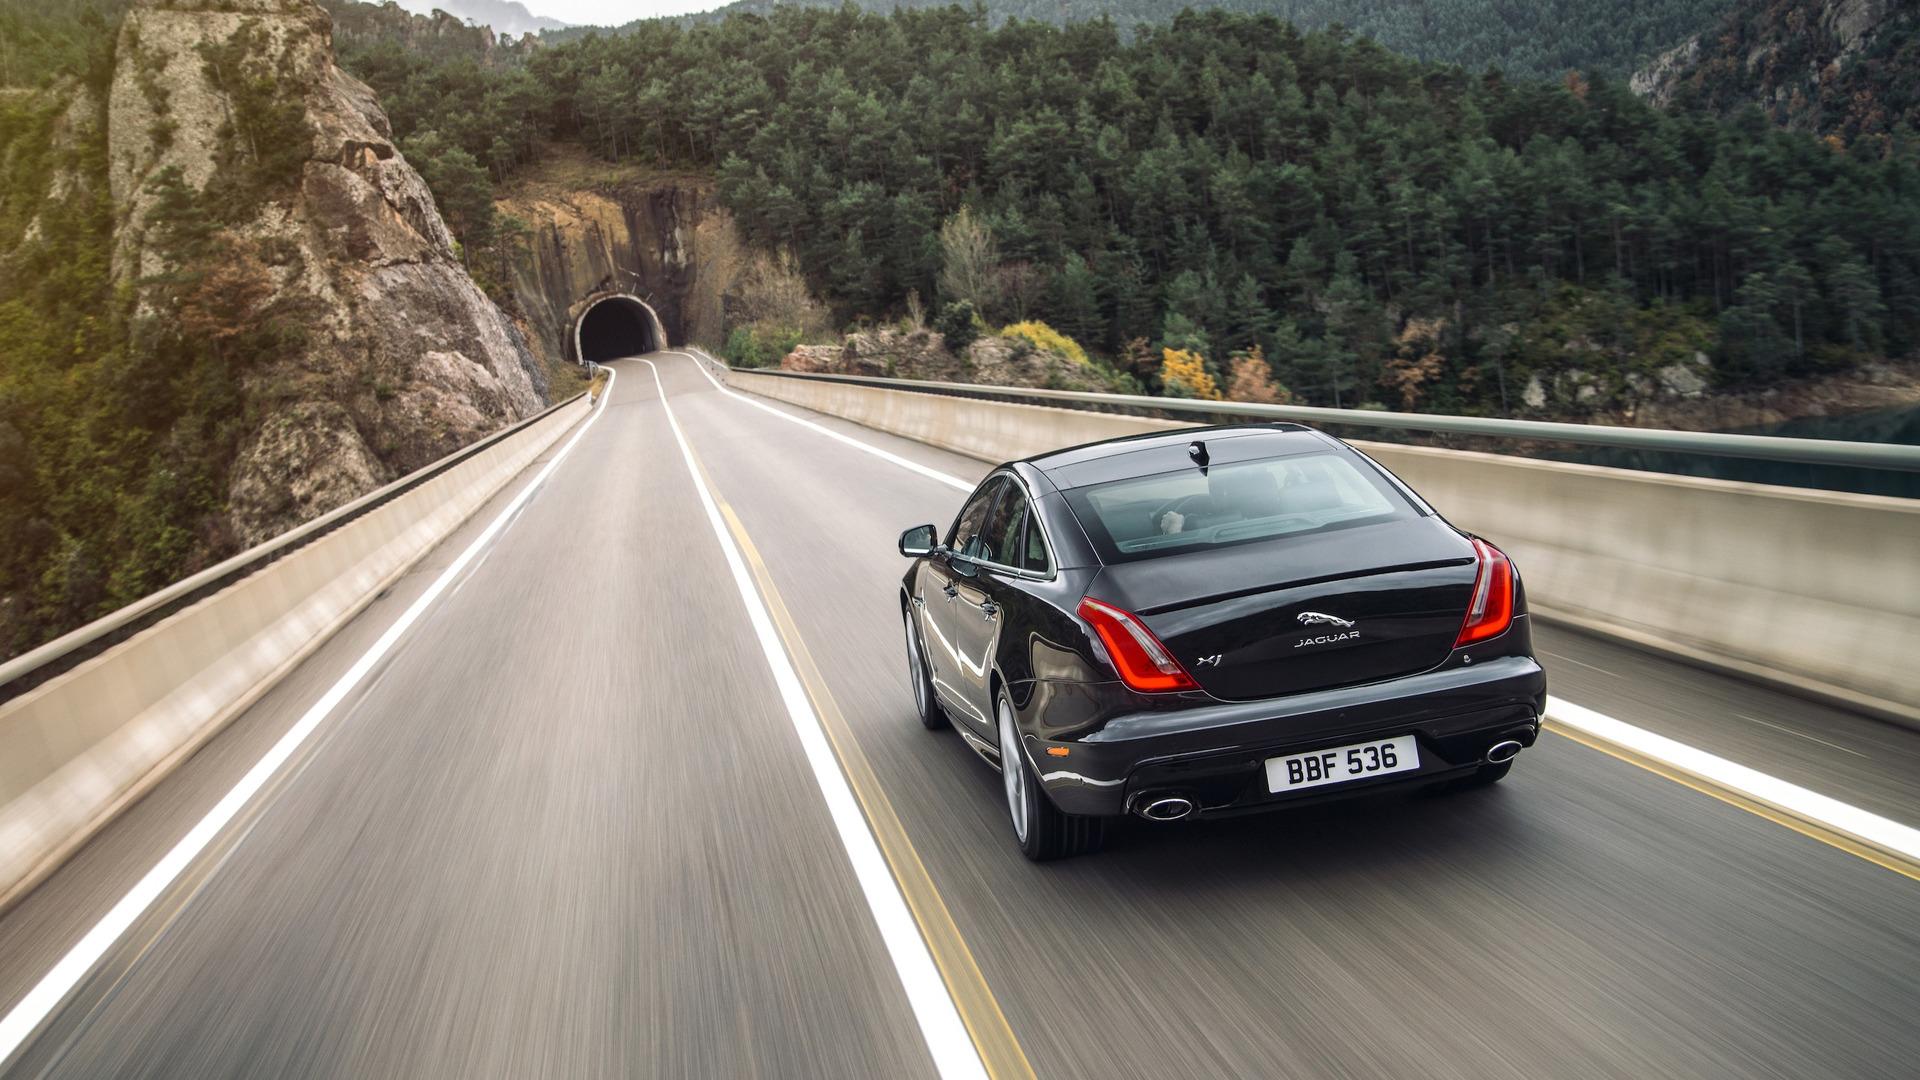 Jaguar Design Boss Talks Next Gen Xj Electric F Type Replacement